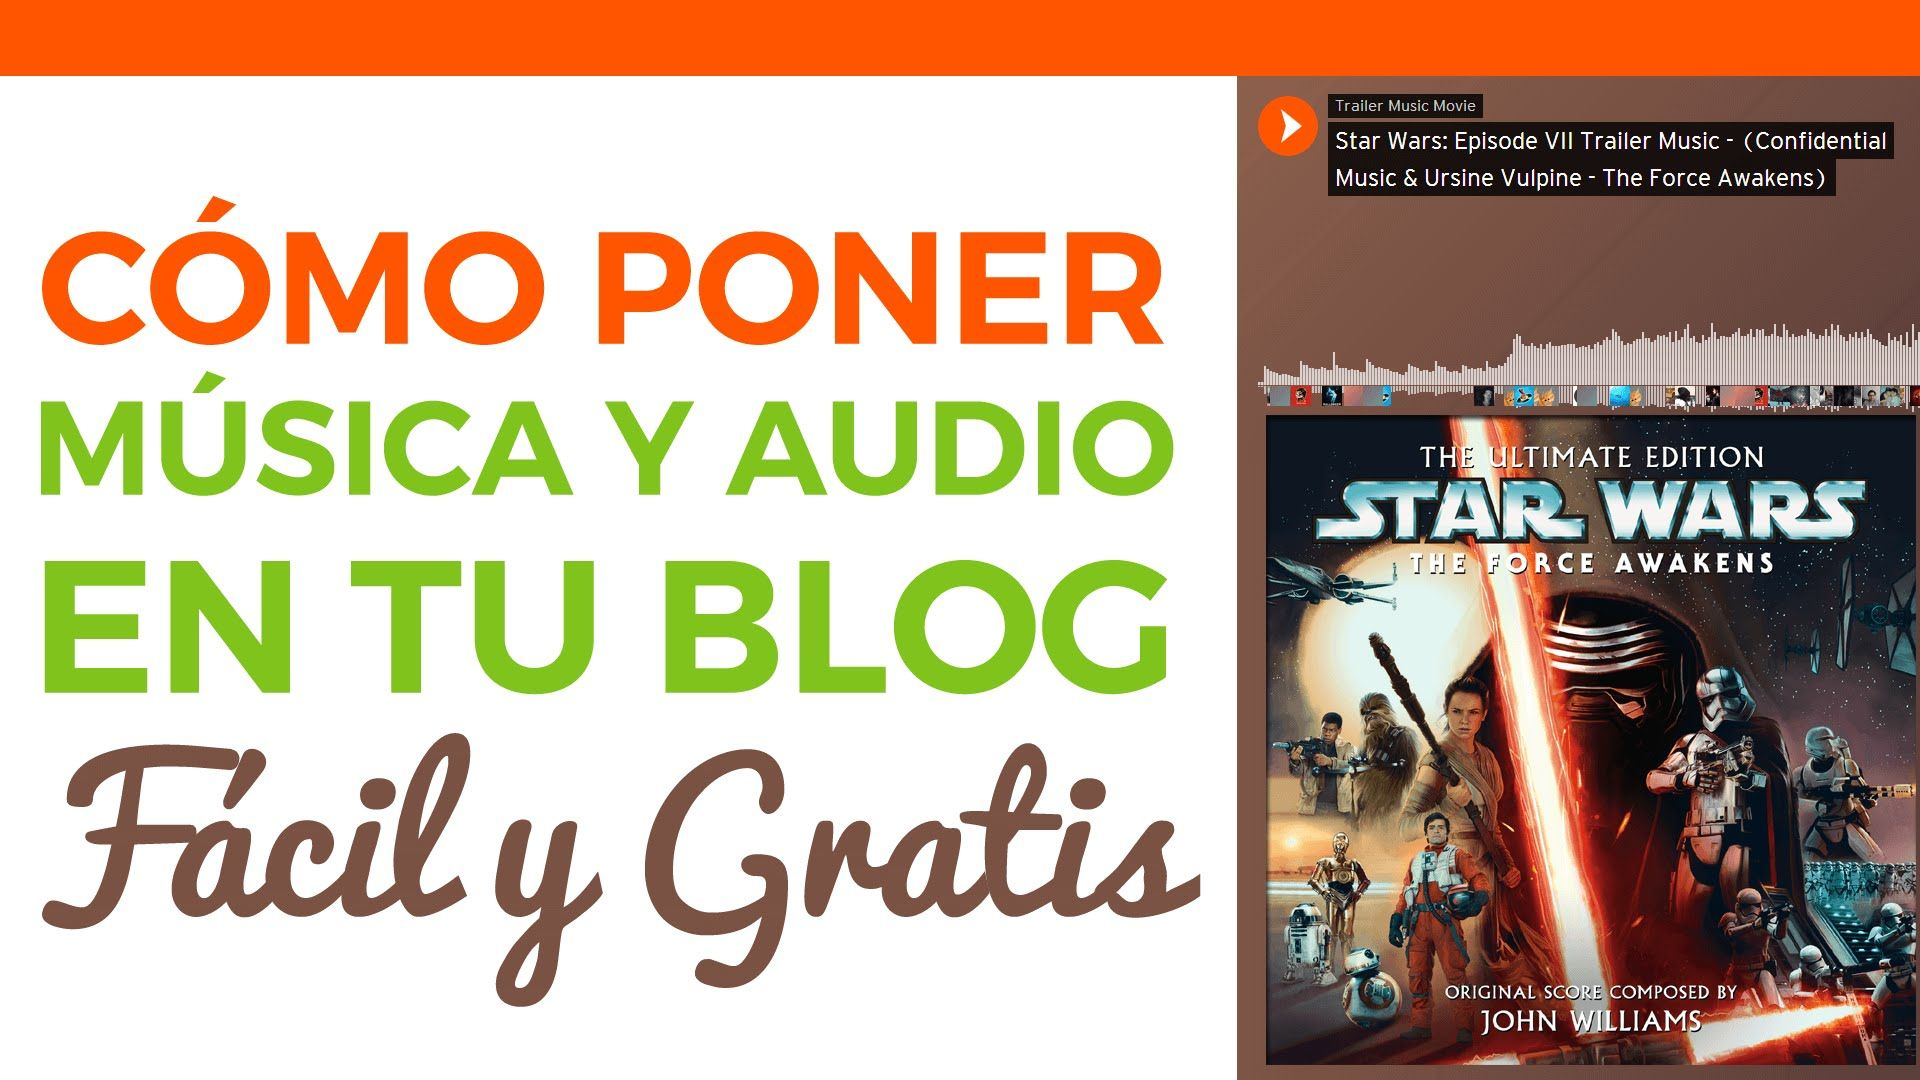 Cómo Poner Música Y Audio En Tu Blog Blog Force Awakens Star Wars